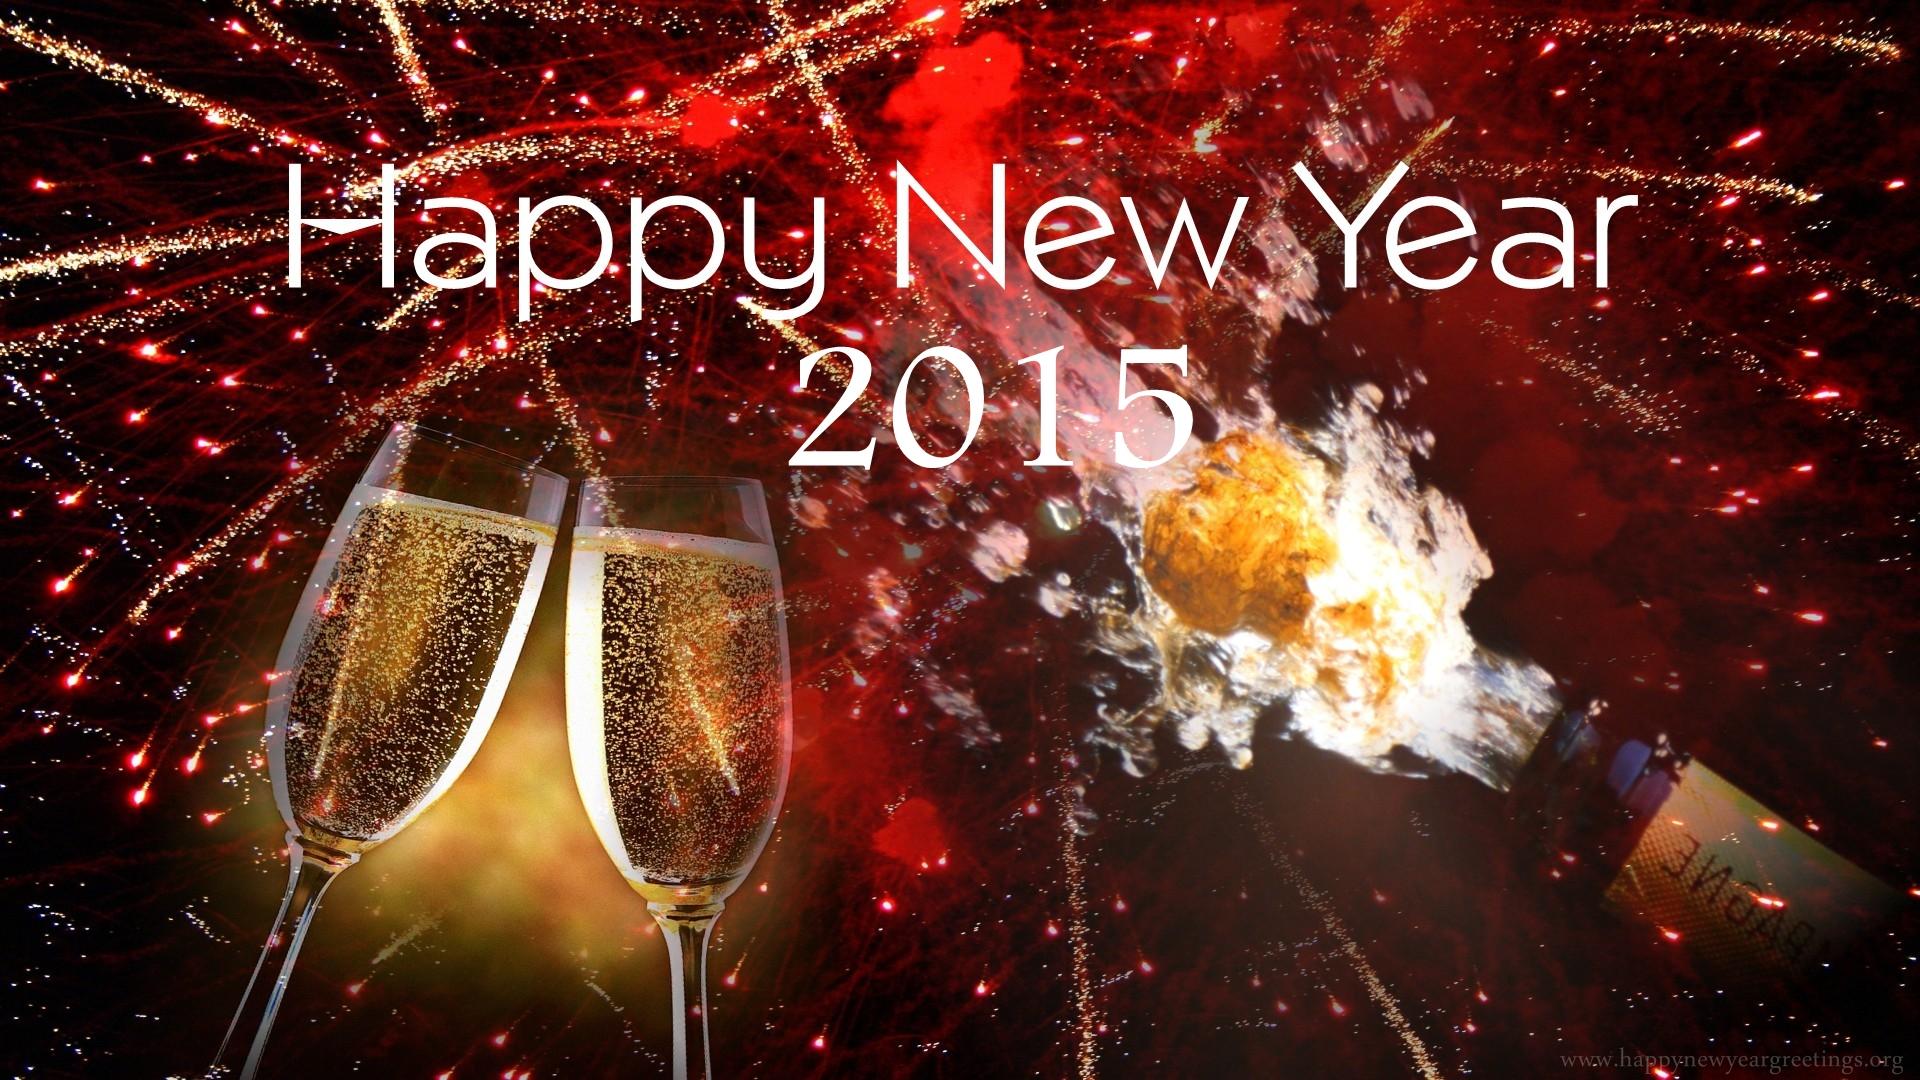 Happy New Year from Keystone Community Living!